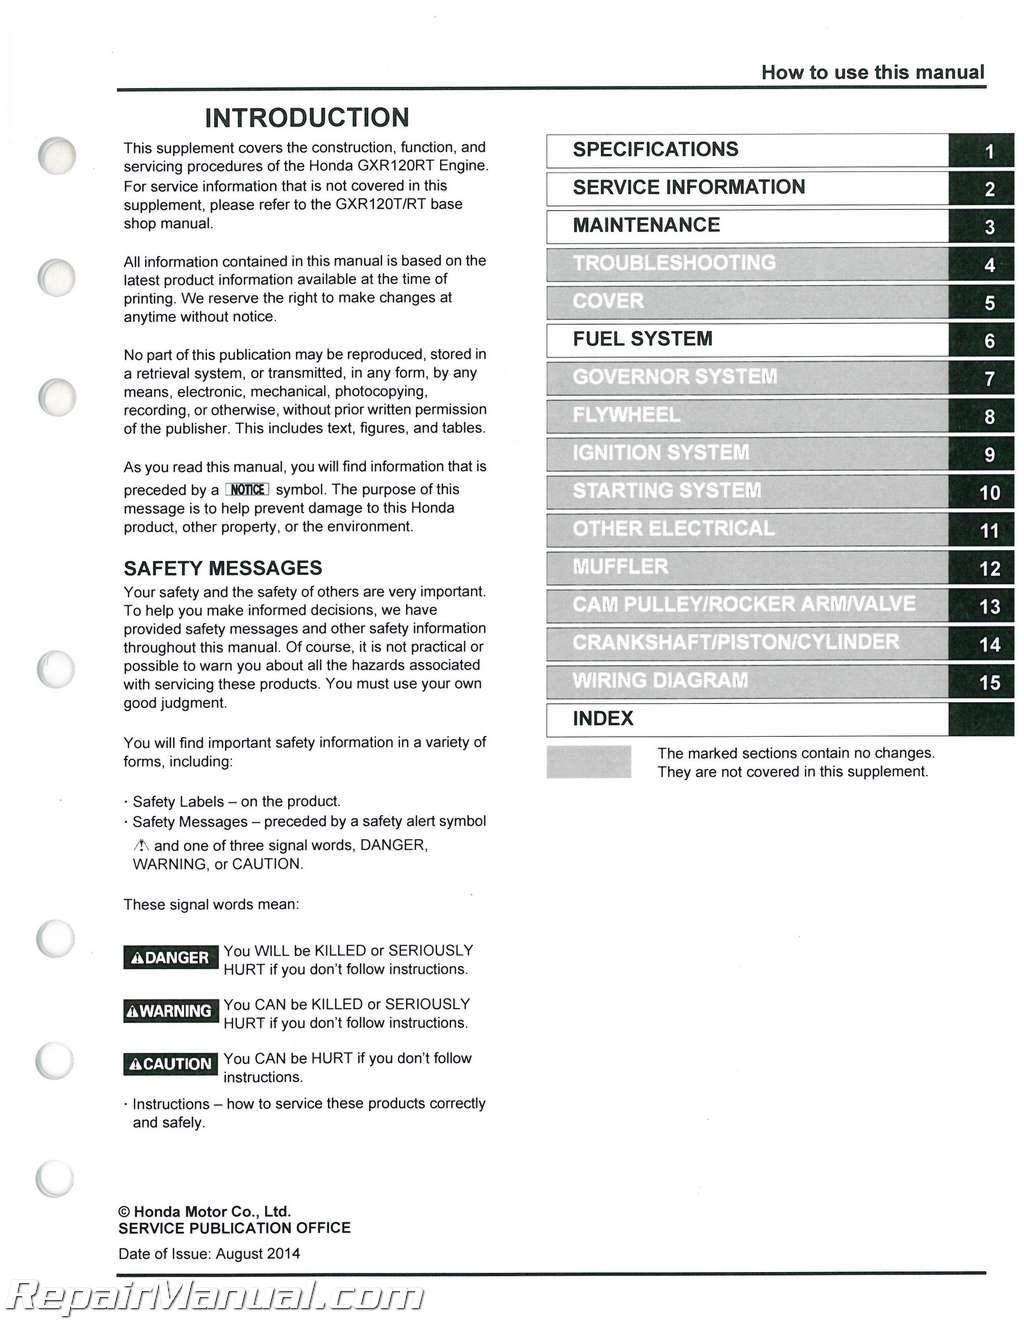 Honda Gxr1200rt Rammer General Purpose Engine Shop Manual Wiring Diagram